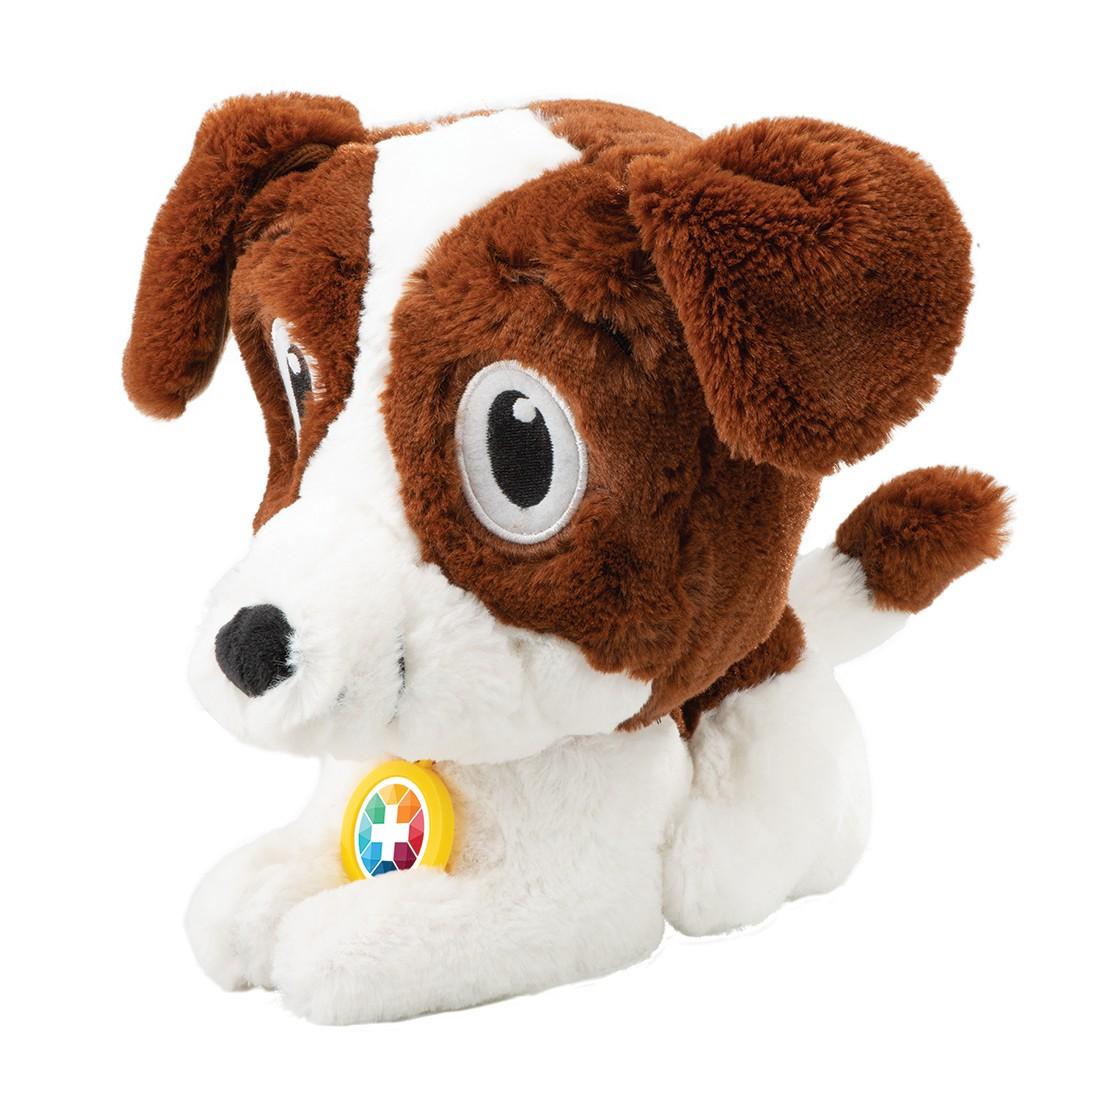 Custom Plush Puppies [image]